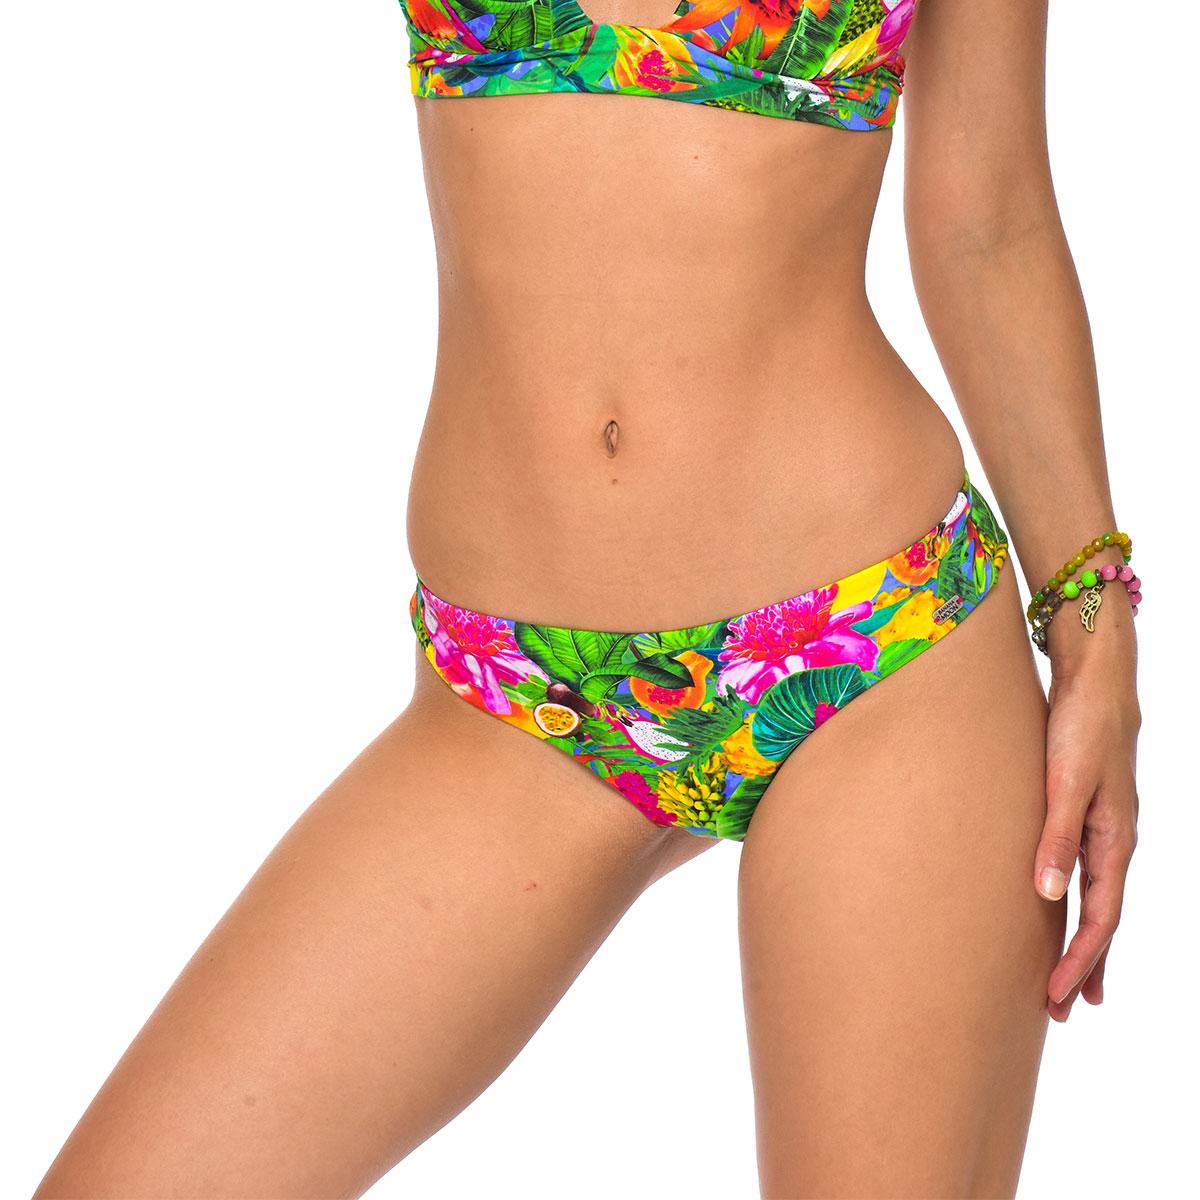 Bas de maillot de bain Tanga Multicolore Tropicool